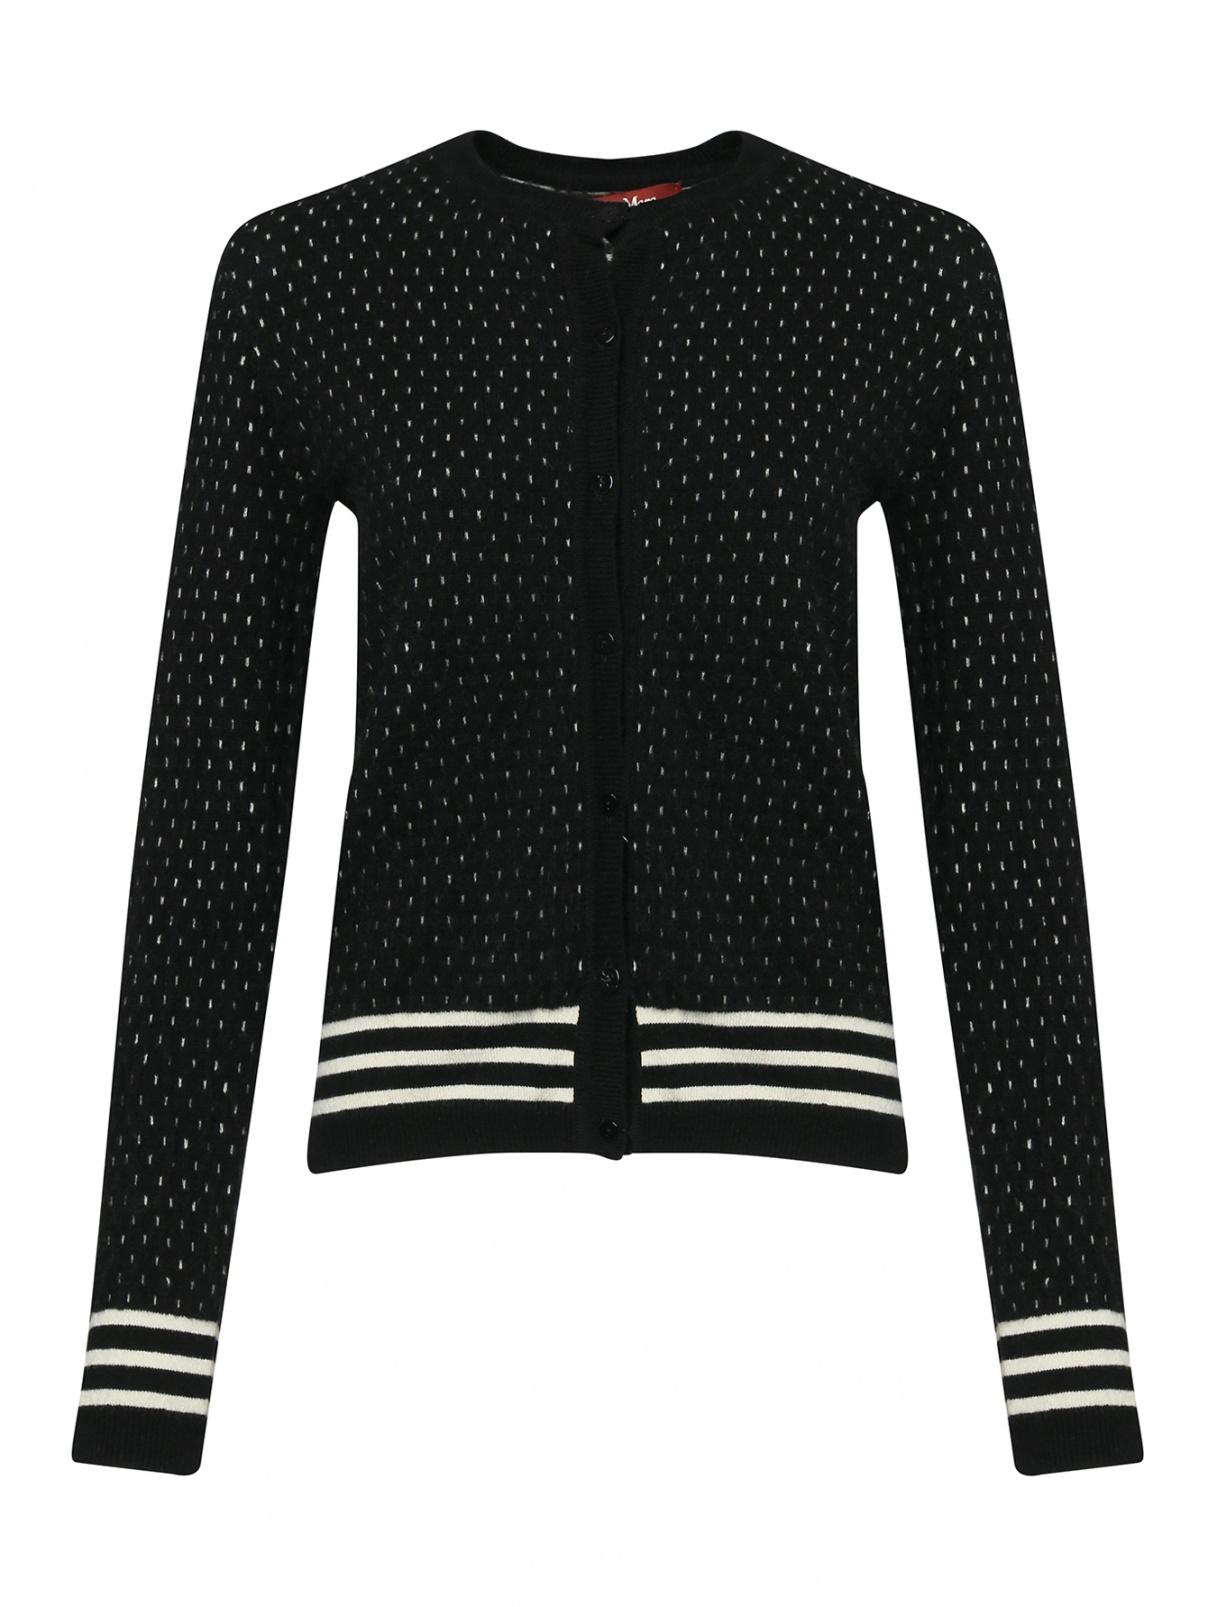 Комплект кардиган и блуза из шерсти Max Mara  –  Общий вид